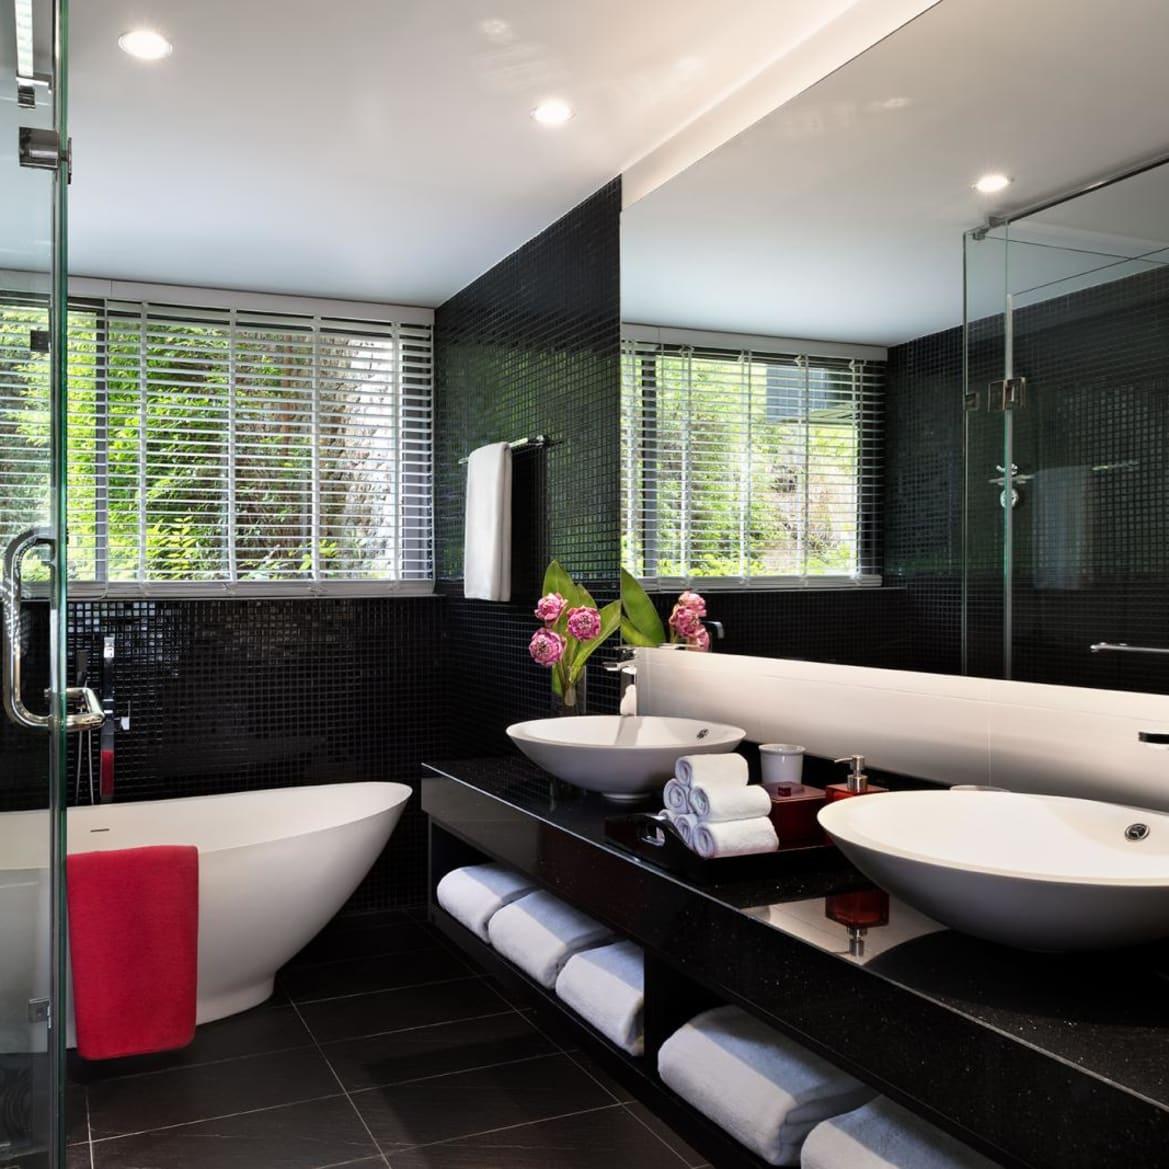 Hill View Suite Bathroom - The Pavilions Phuket